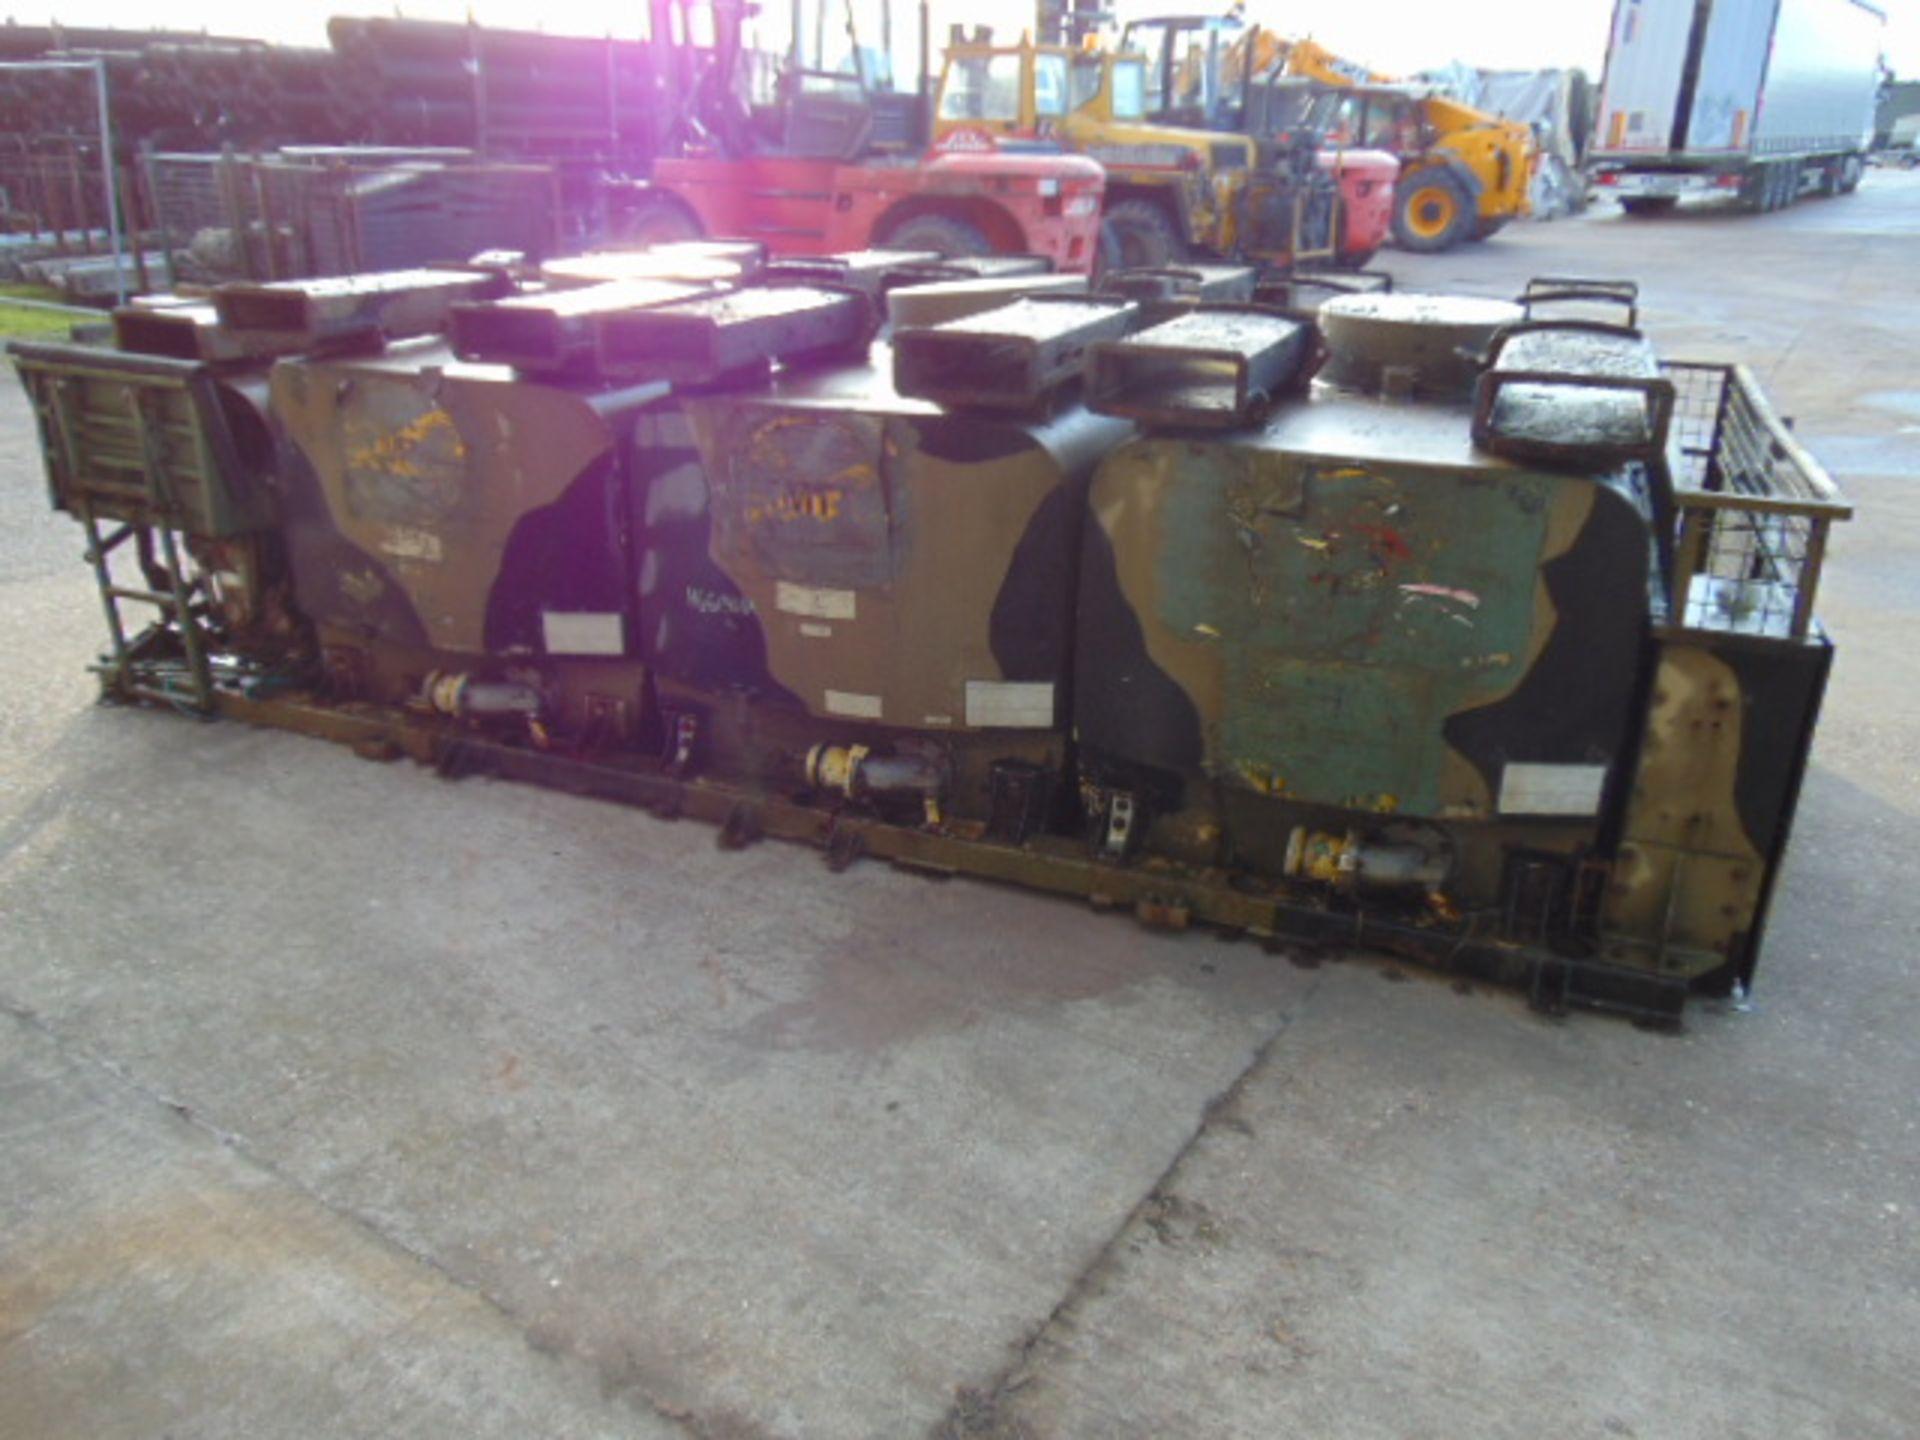 Lot 26815 - UBRE Demountable Bulk Fuel Dispensing System